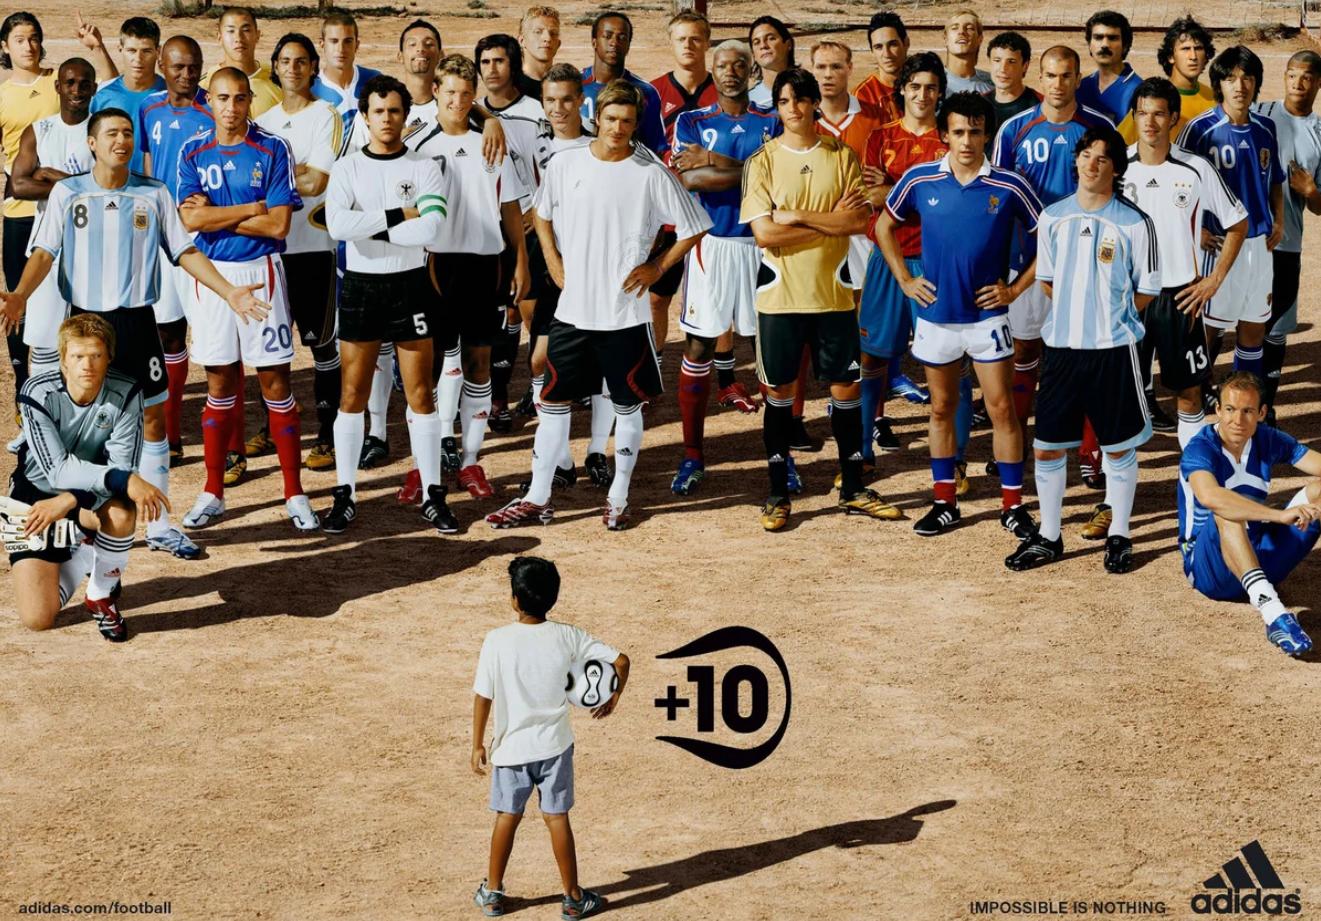 Jose +10 (2006)